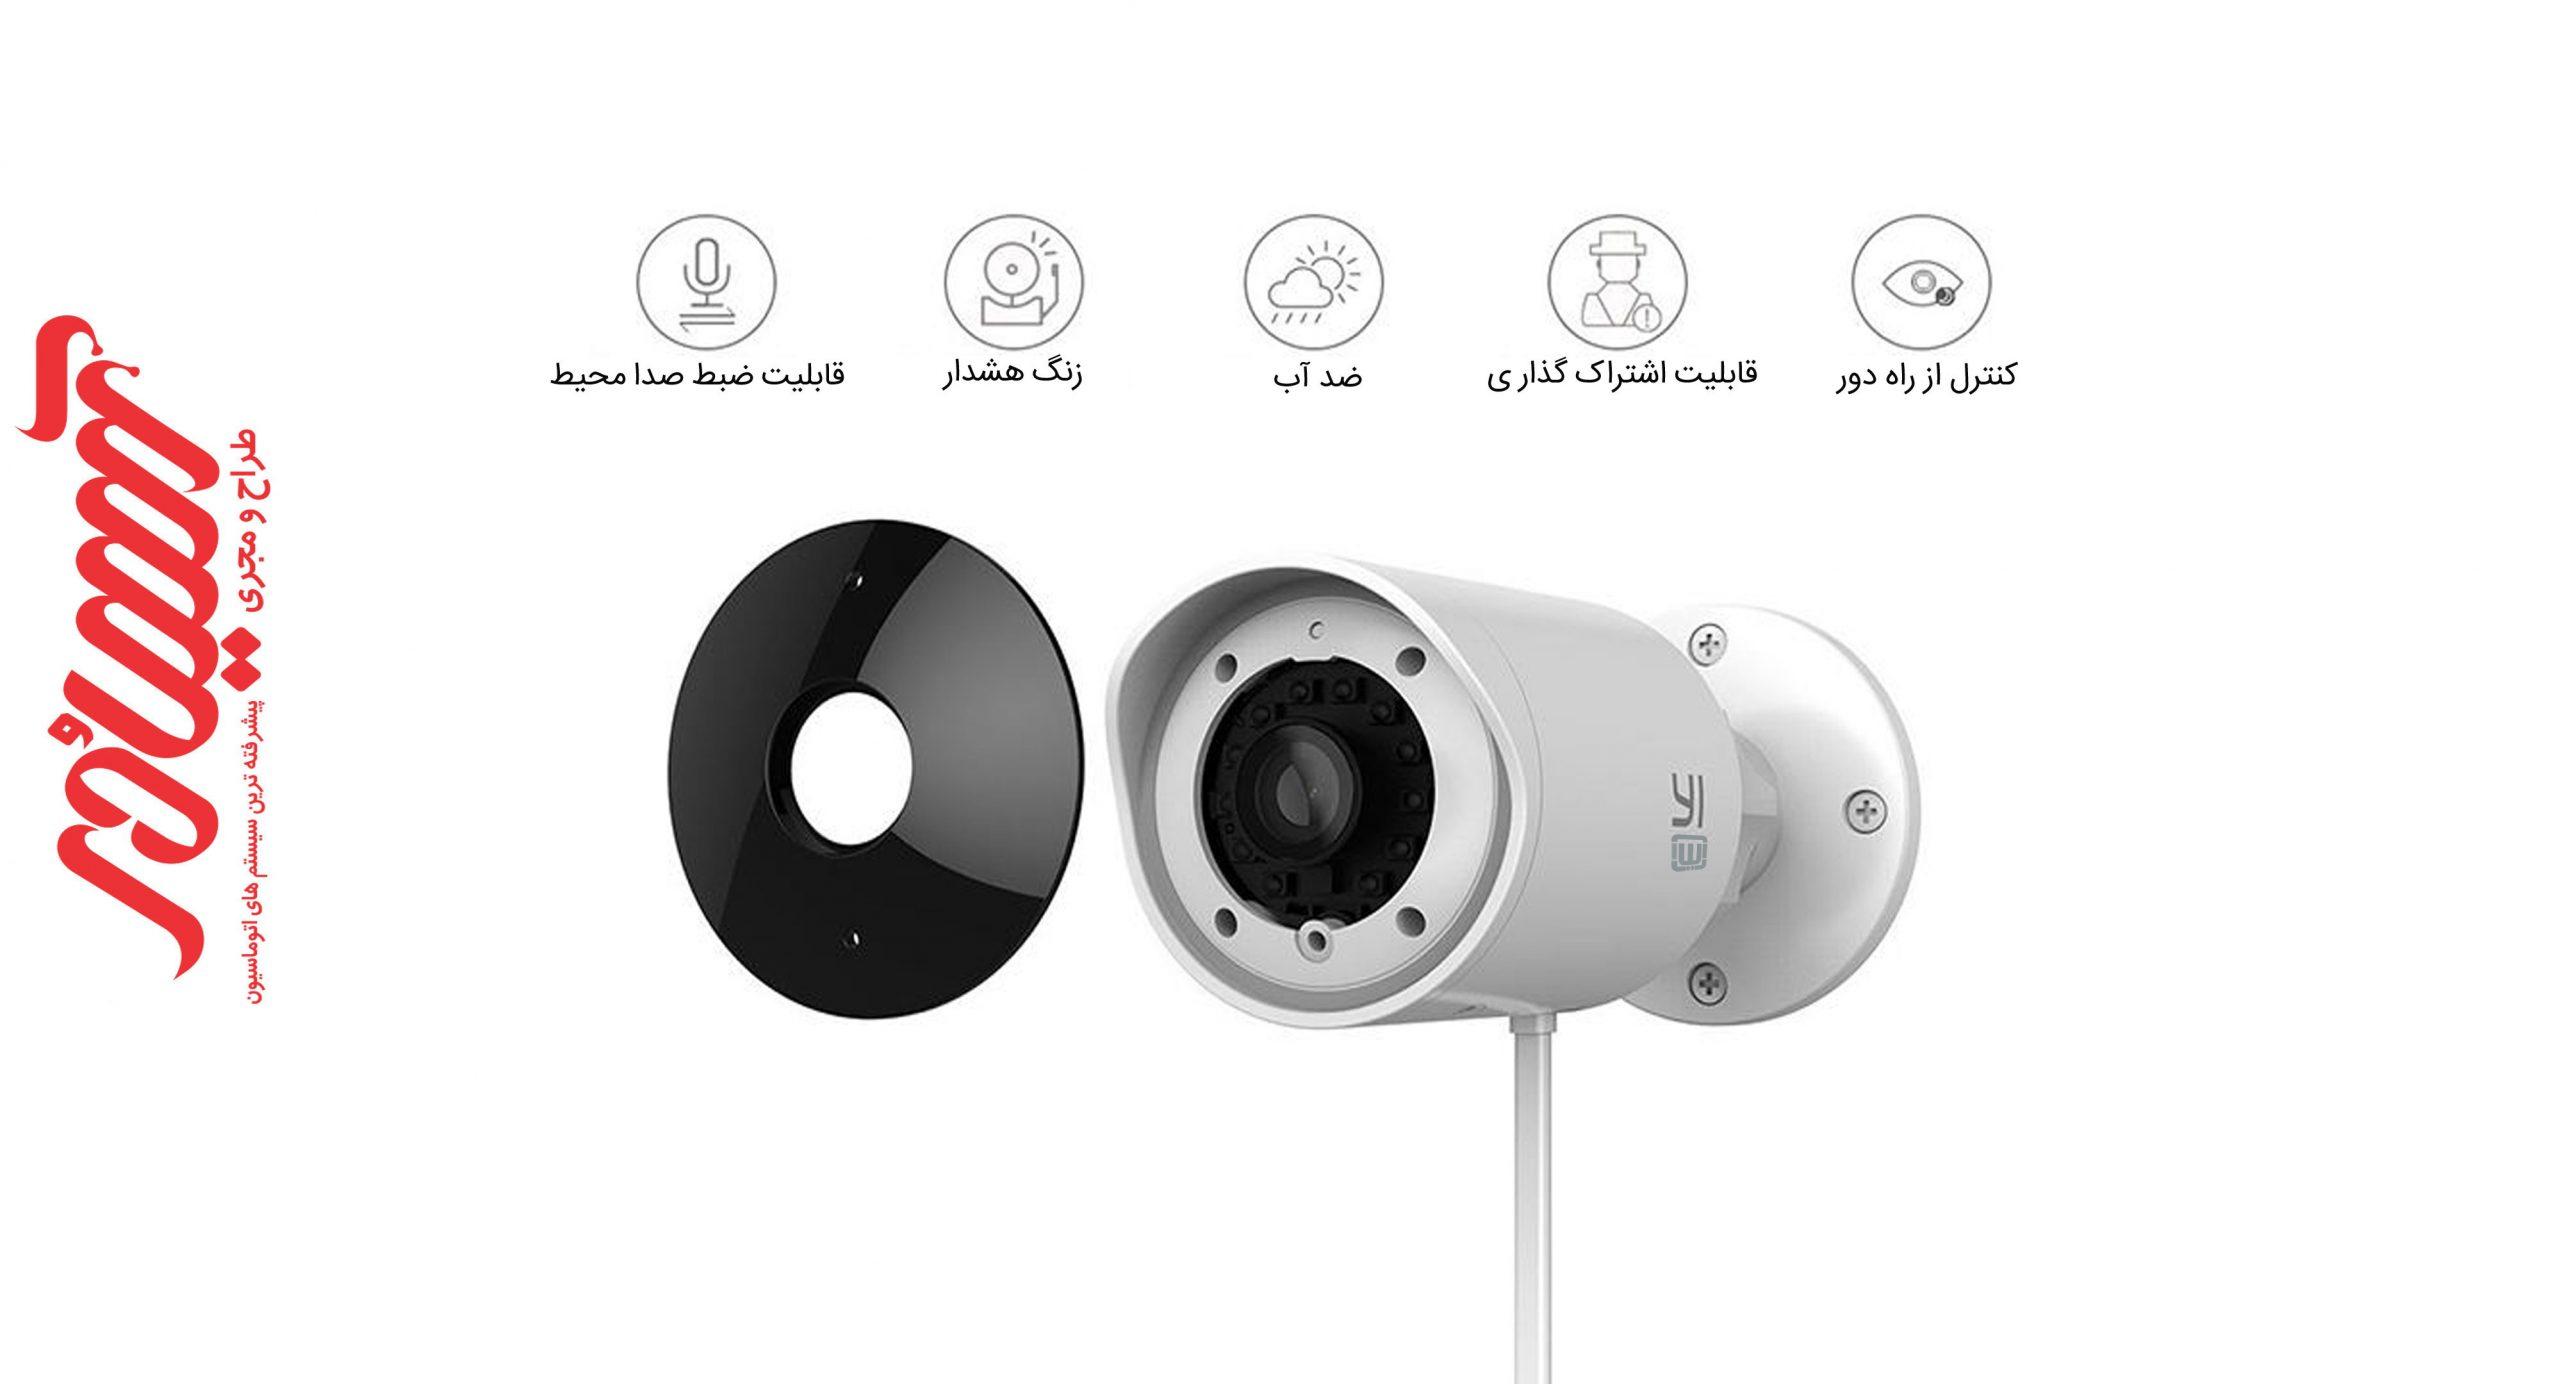 دوربین مداربسته Xiaomi Yi 1080P گلوبال